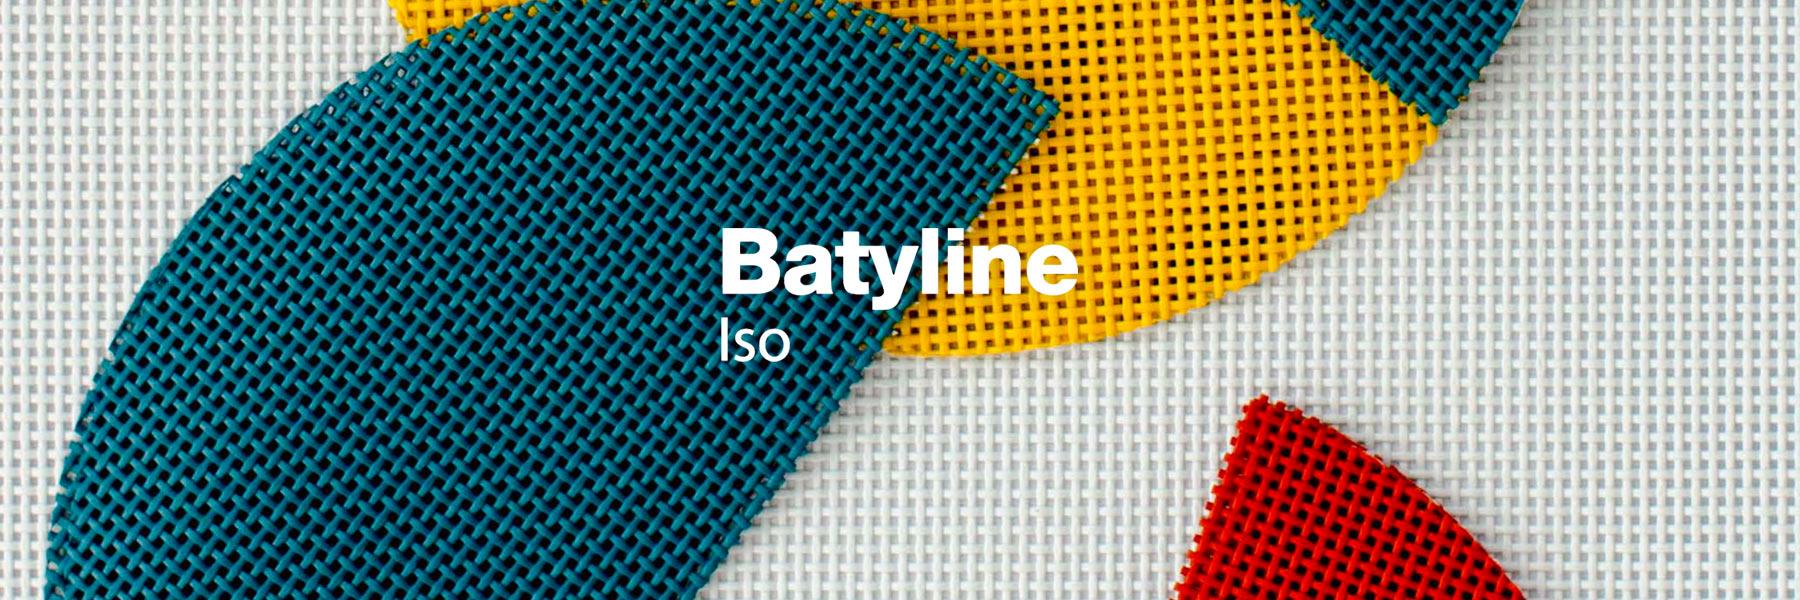 Serge Ferrari Batyline ISO header